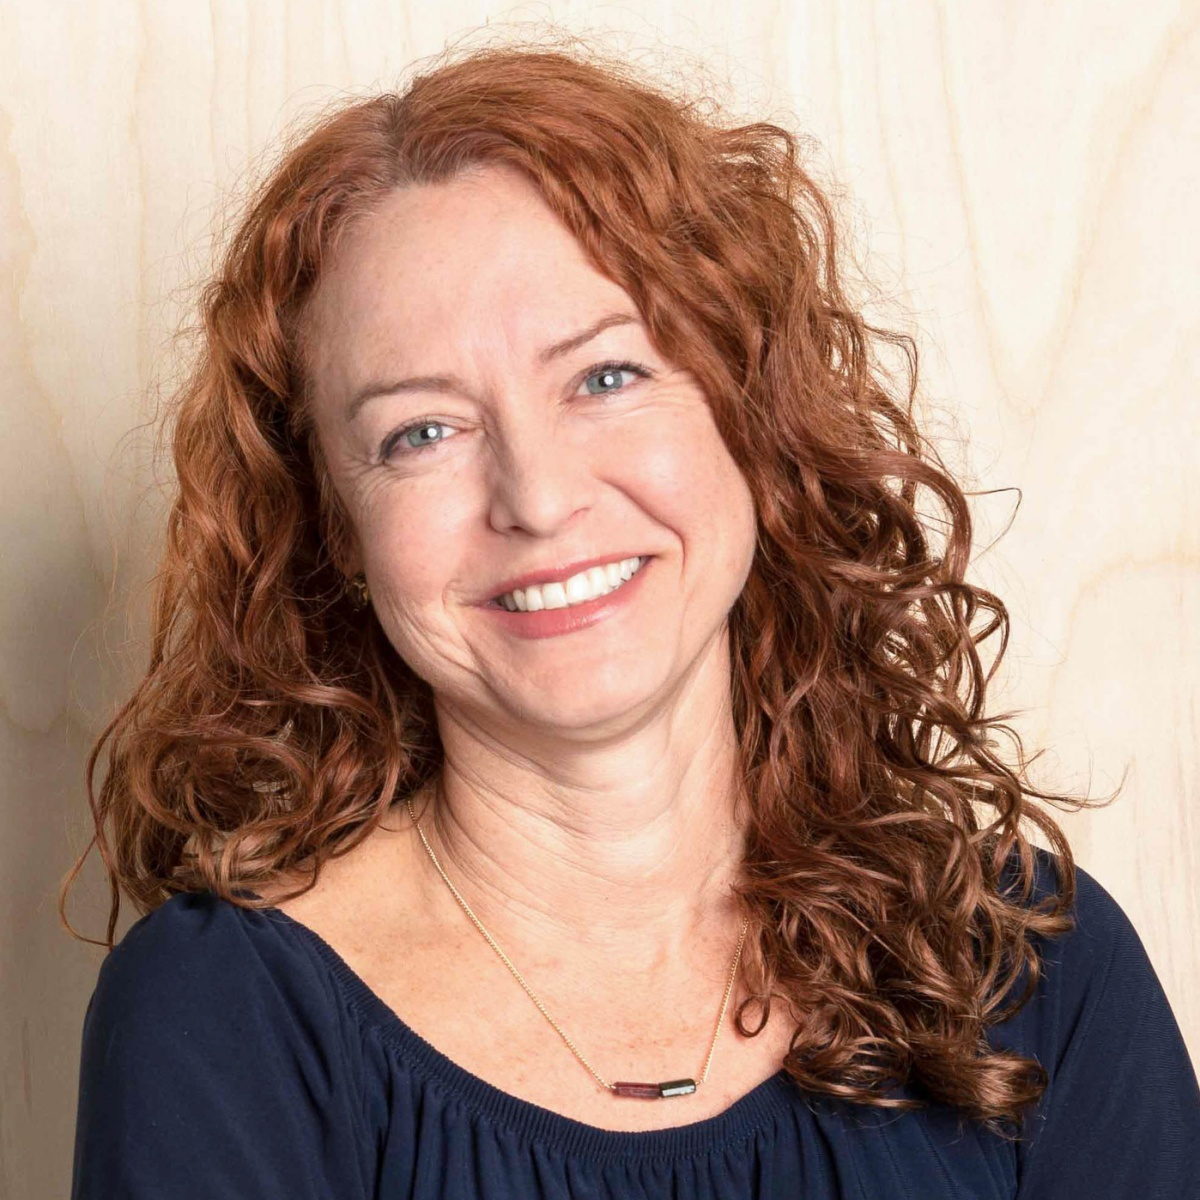 Sonja Bochart